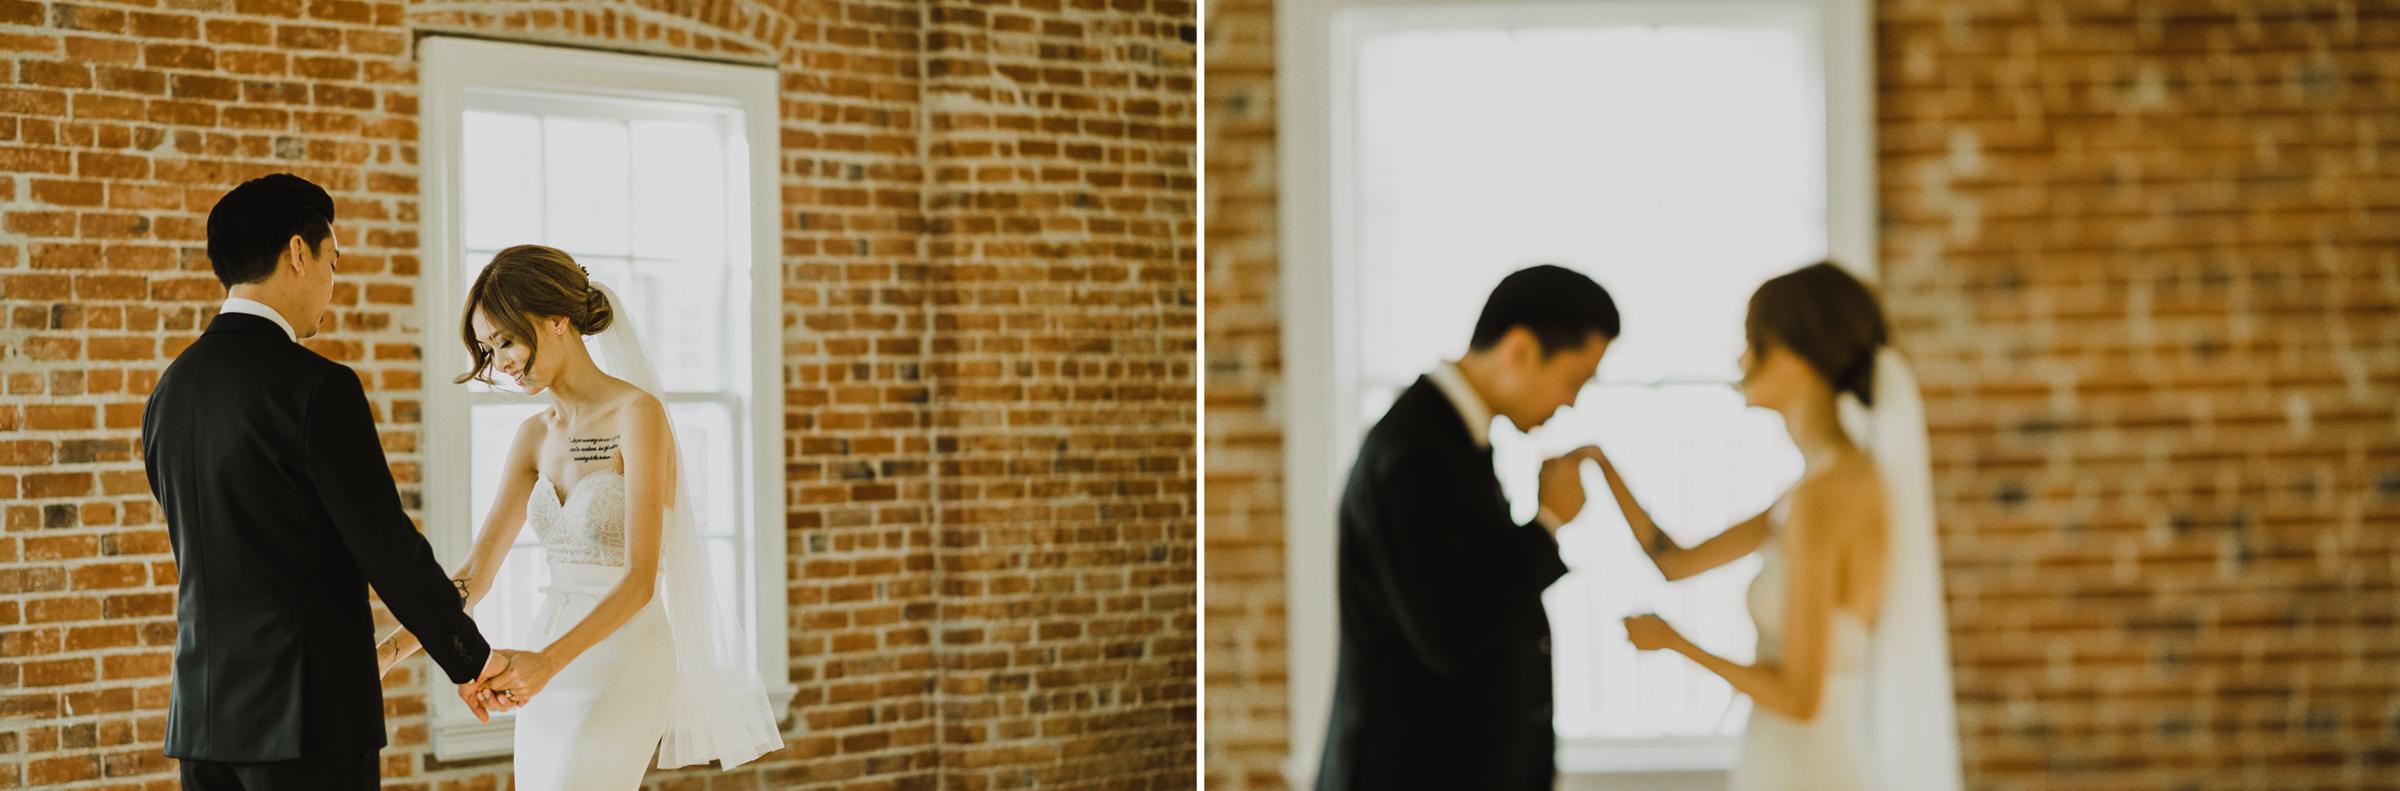 ©Isaiah + Taylor Photography - The Estate On Second Wedding, Santa Ana - Orange County Wedding Photographer-35.jpg